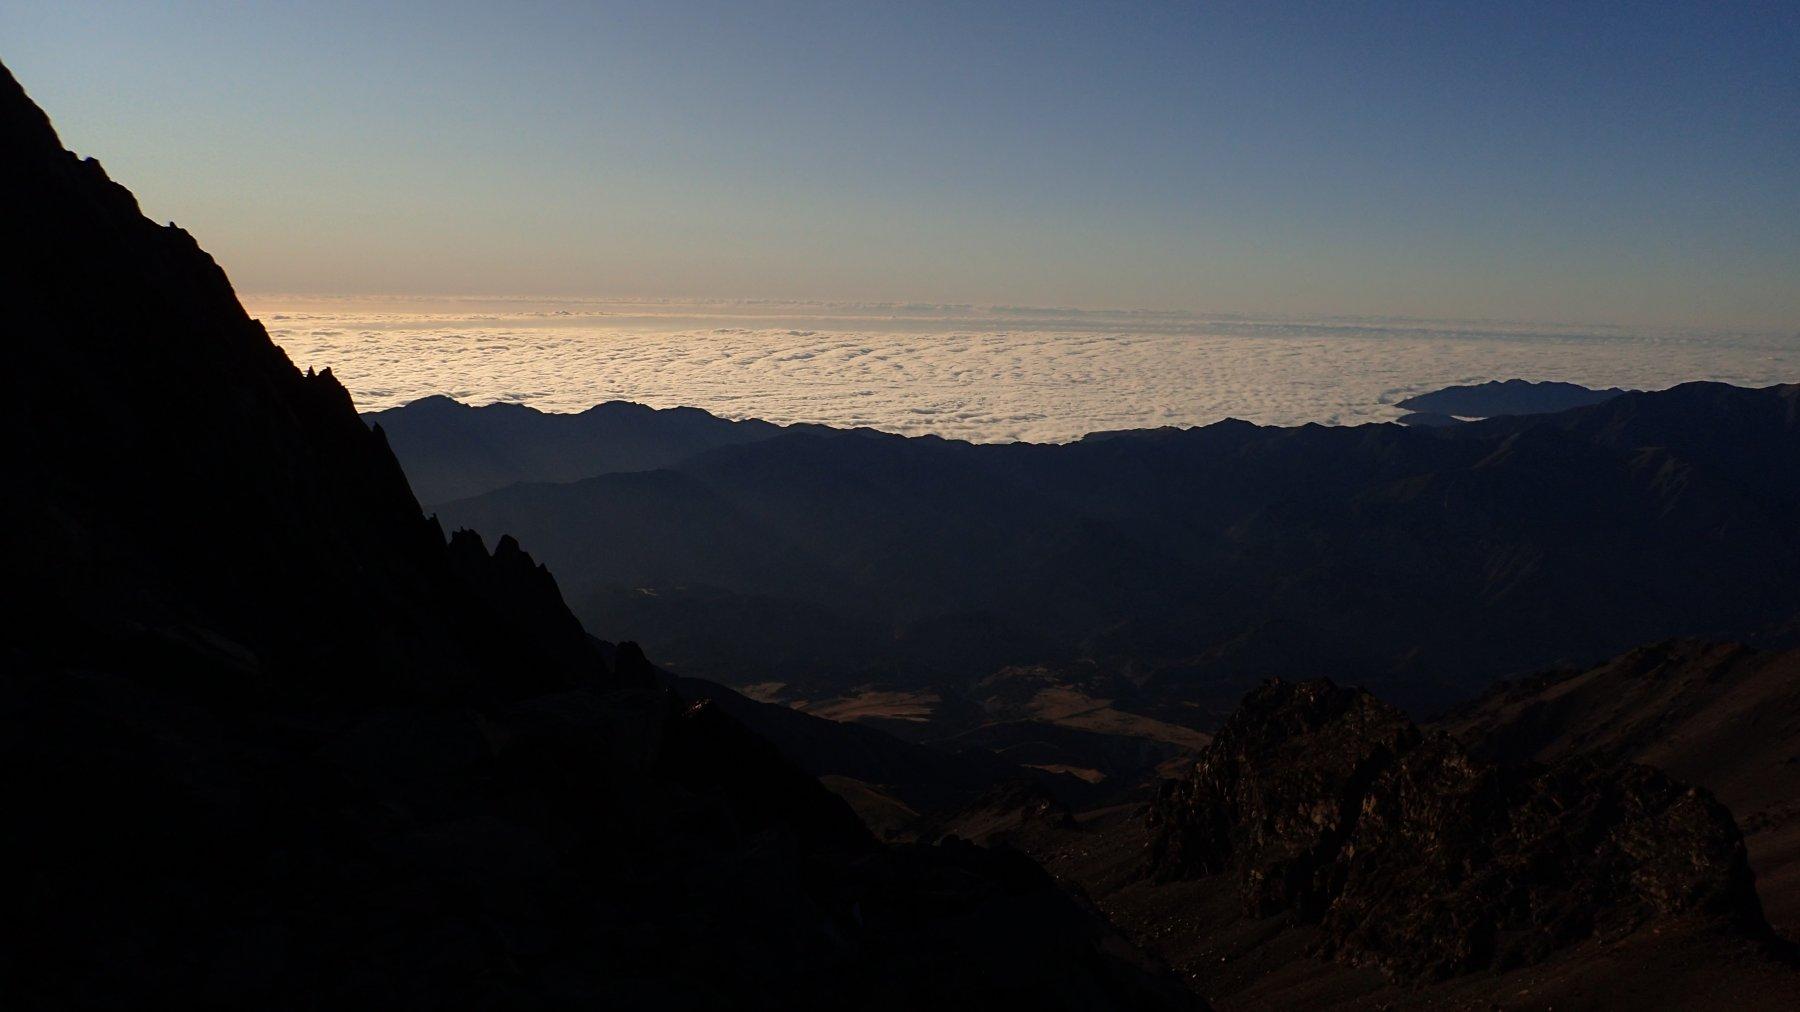 Mare di nubi su Kaikoura